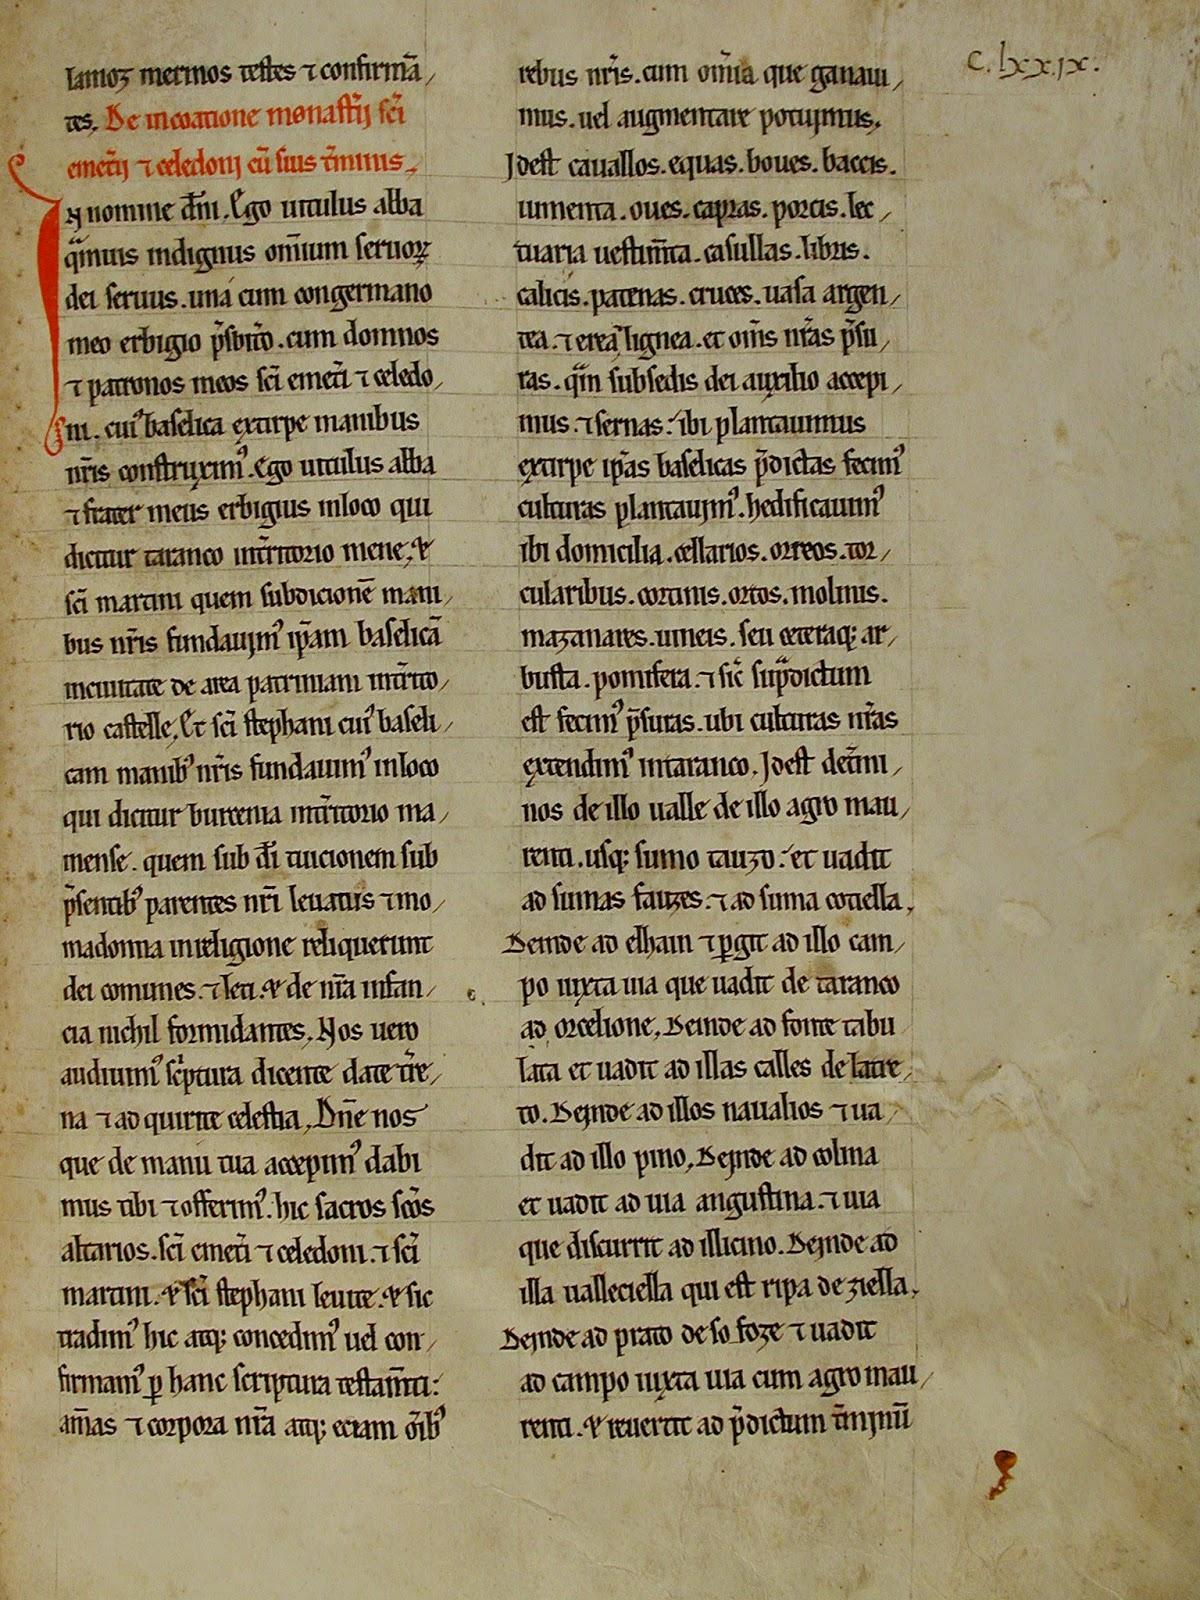 Diploma Taranco de Mena, año 800